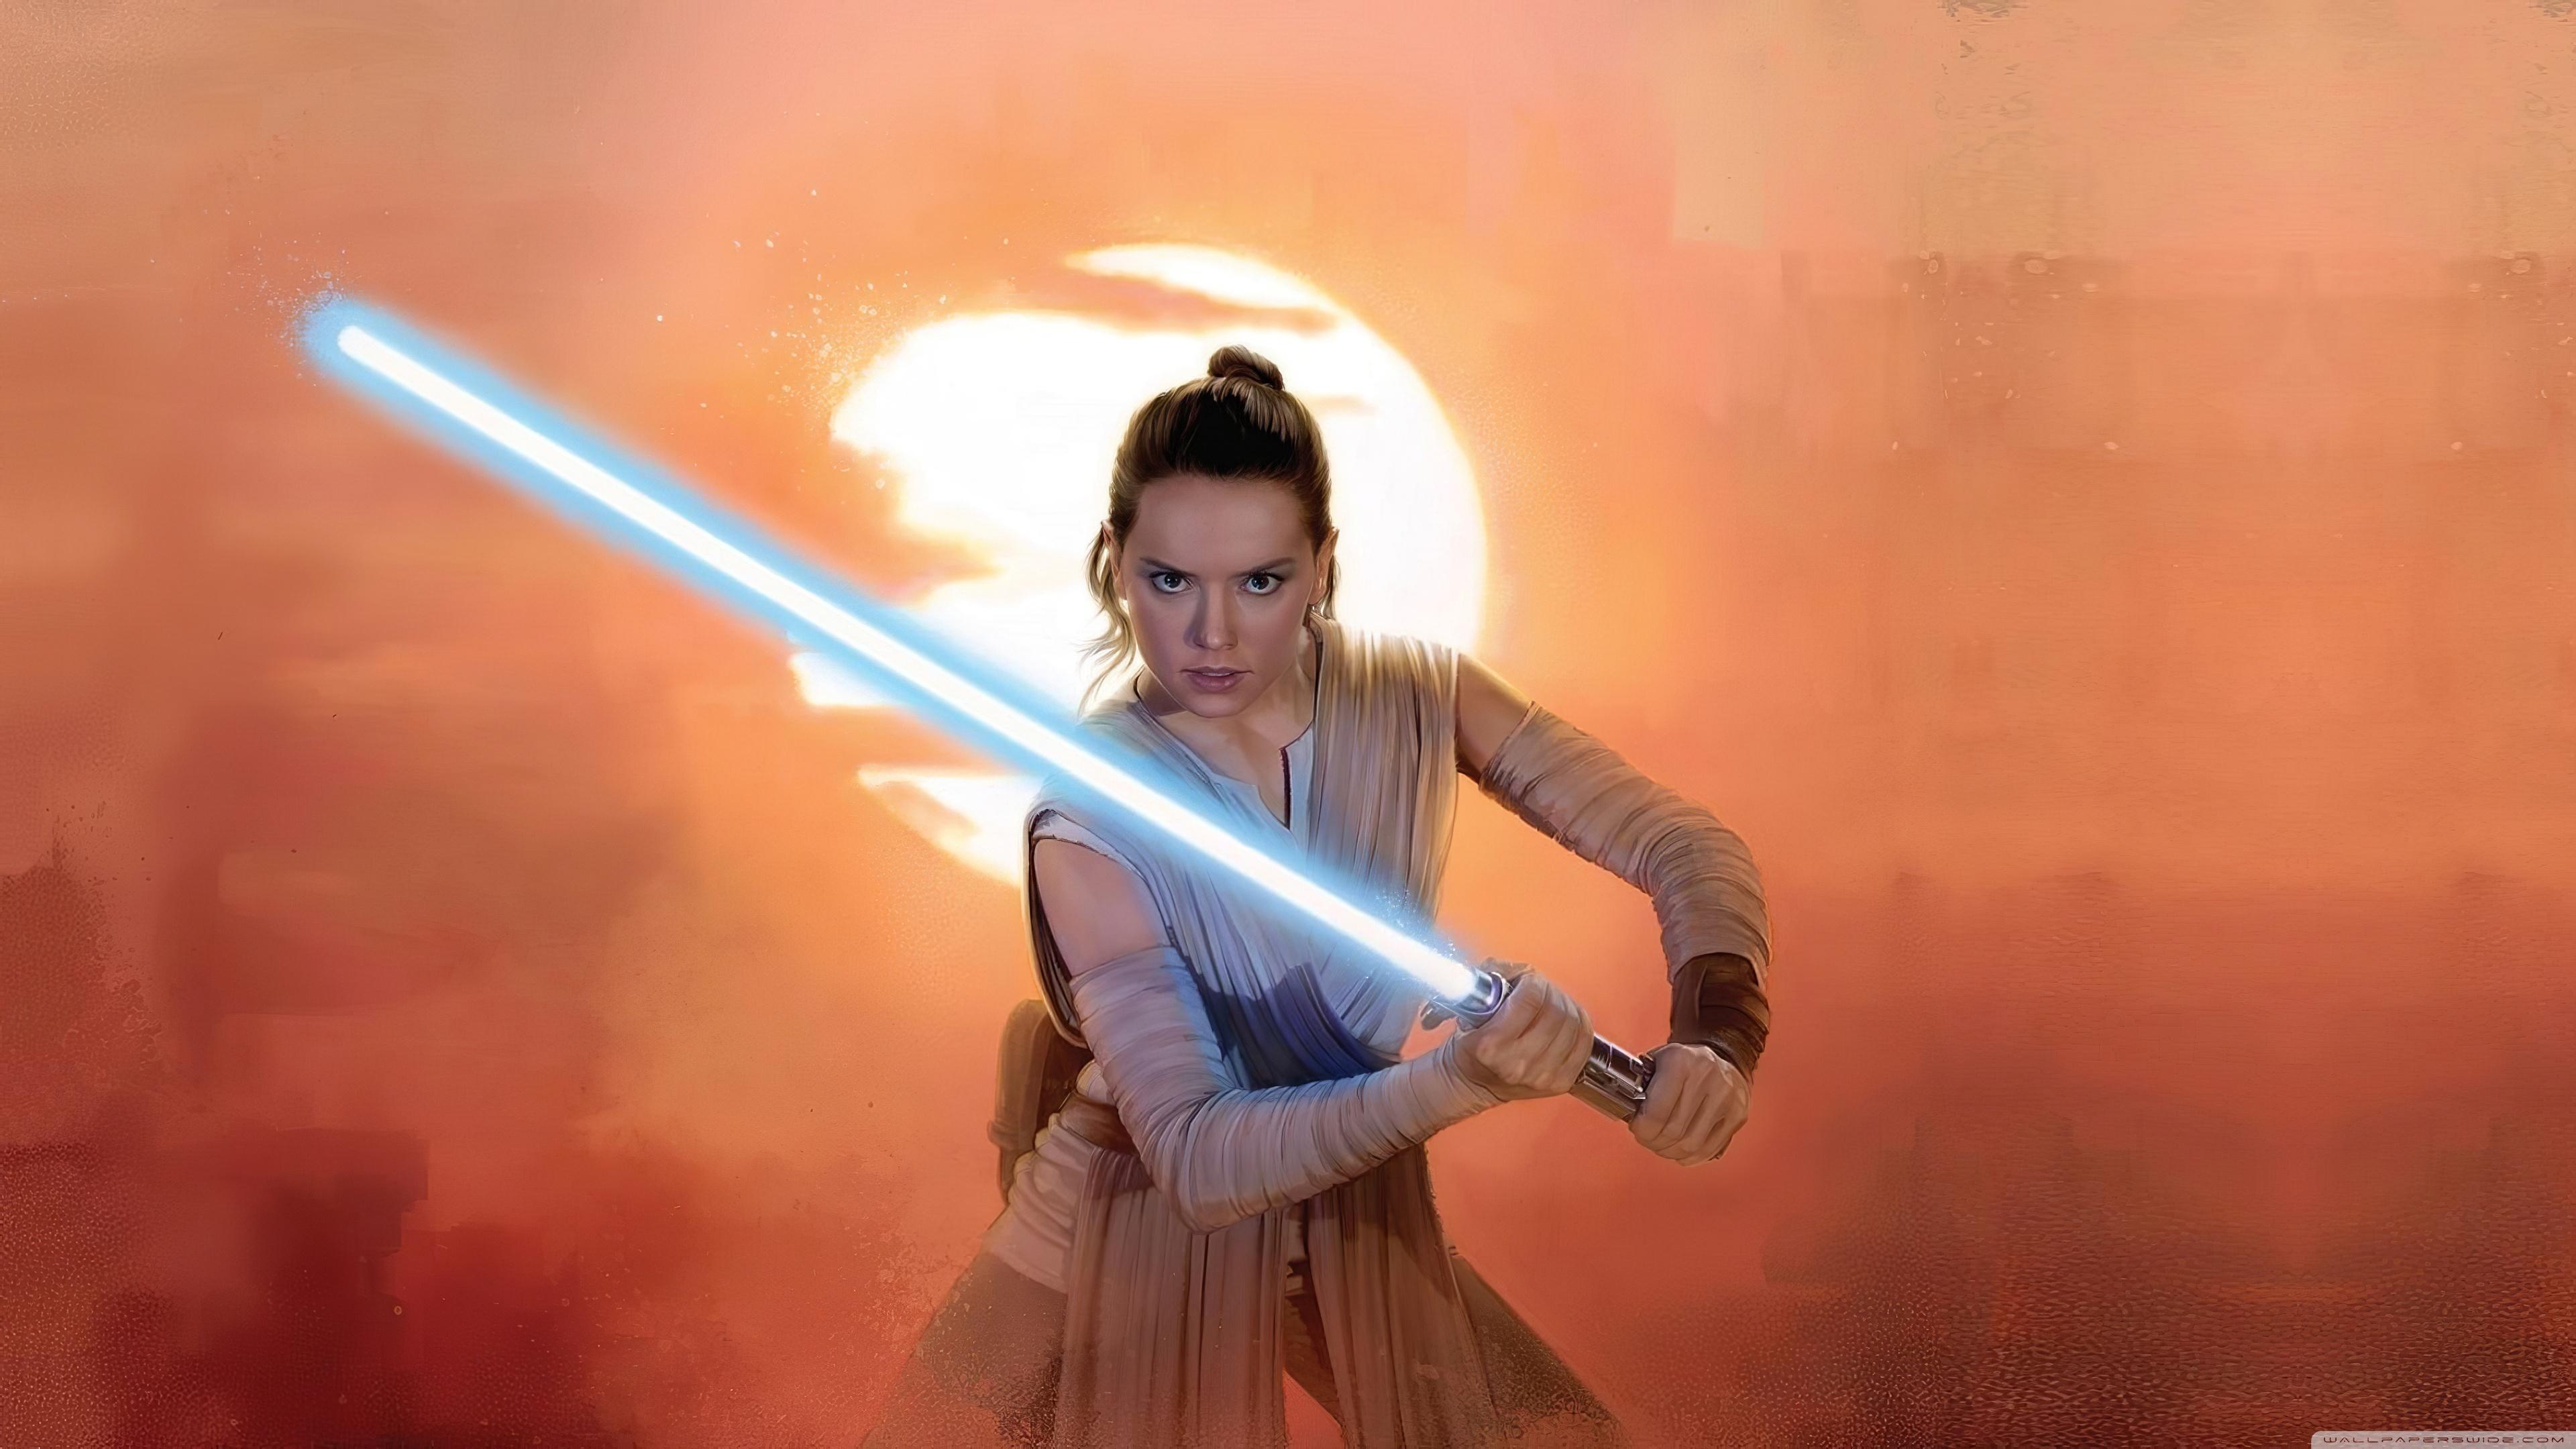 Star Wars Rey 3840x2160 Download Hd Wallpaper Wallpapertip